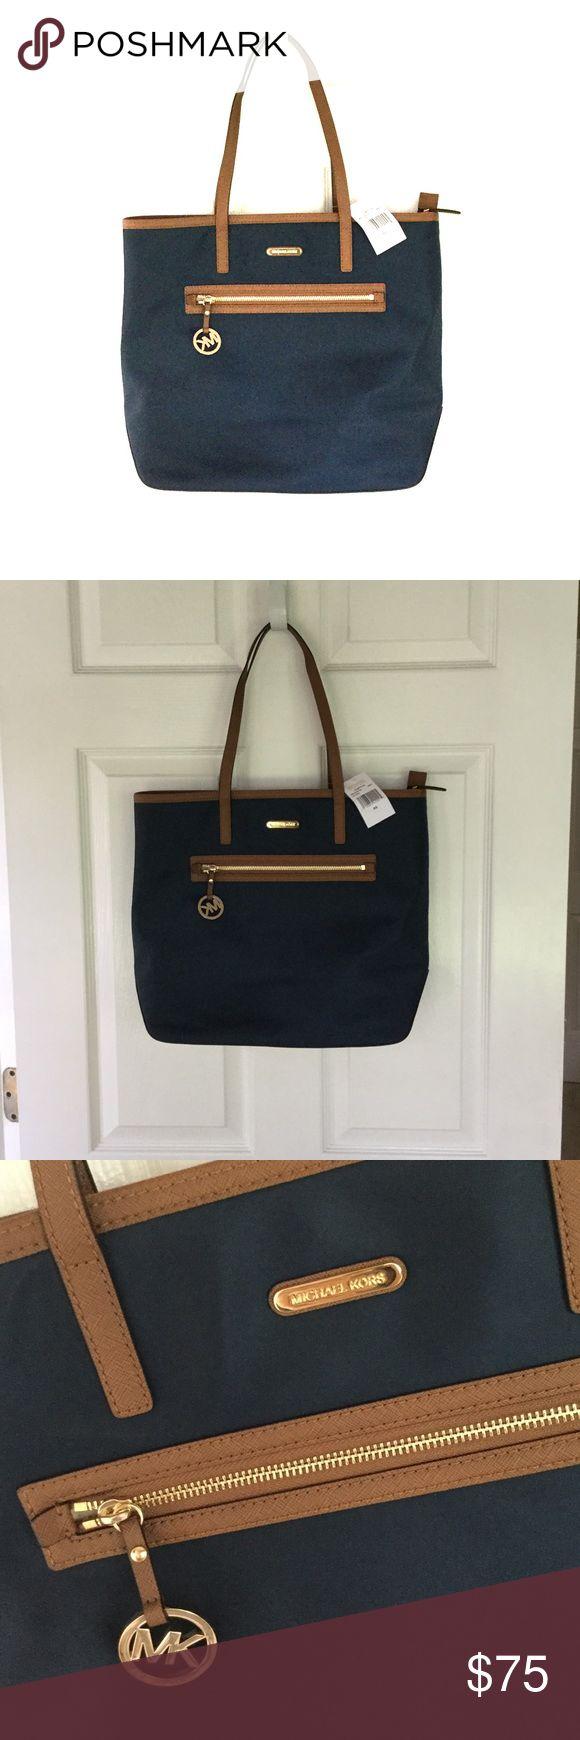 Michael Kors navy shoulder bag Michael Kors navy shoulder bag. NWT. Lots of room. Double handle. Never worn/used. Michael Kors Bags Shoulder Bags